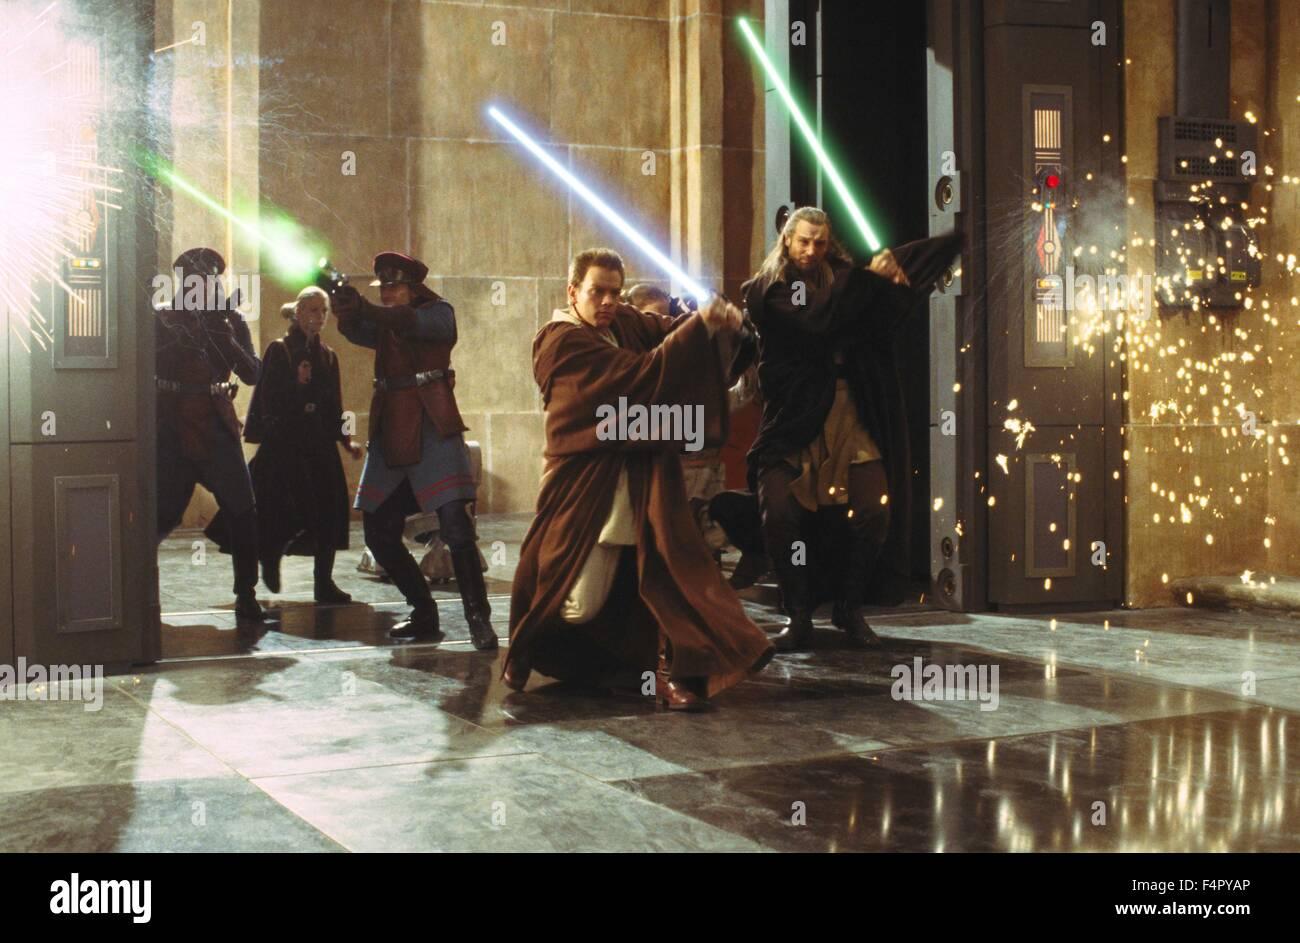 Liam Neeson And Ewan Mcgregor Star Wars Episode I The Phantom Stock Photo Alamy